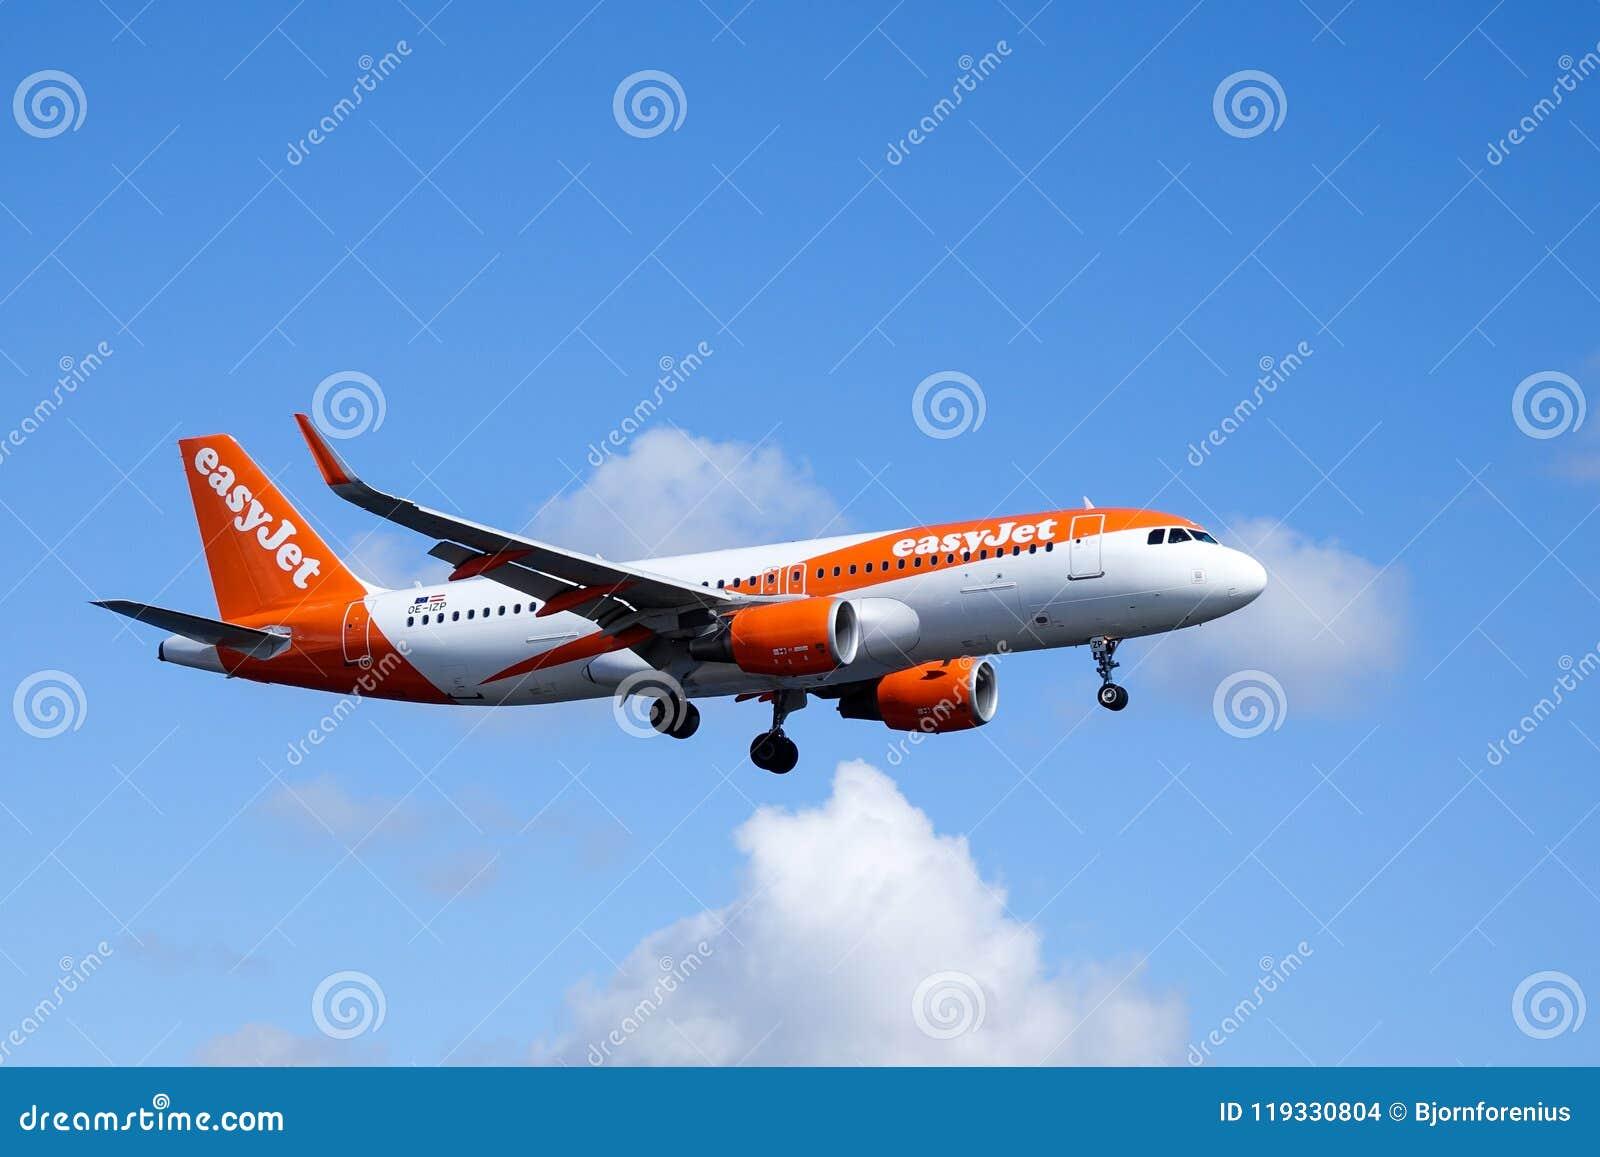 Easyjet, Airbus A320 - 214 fliegend